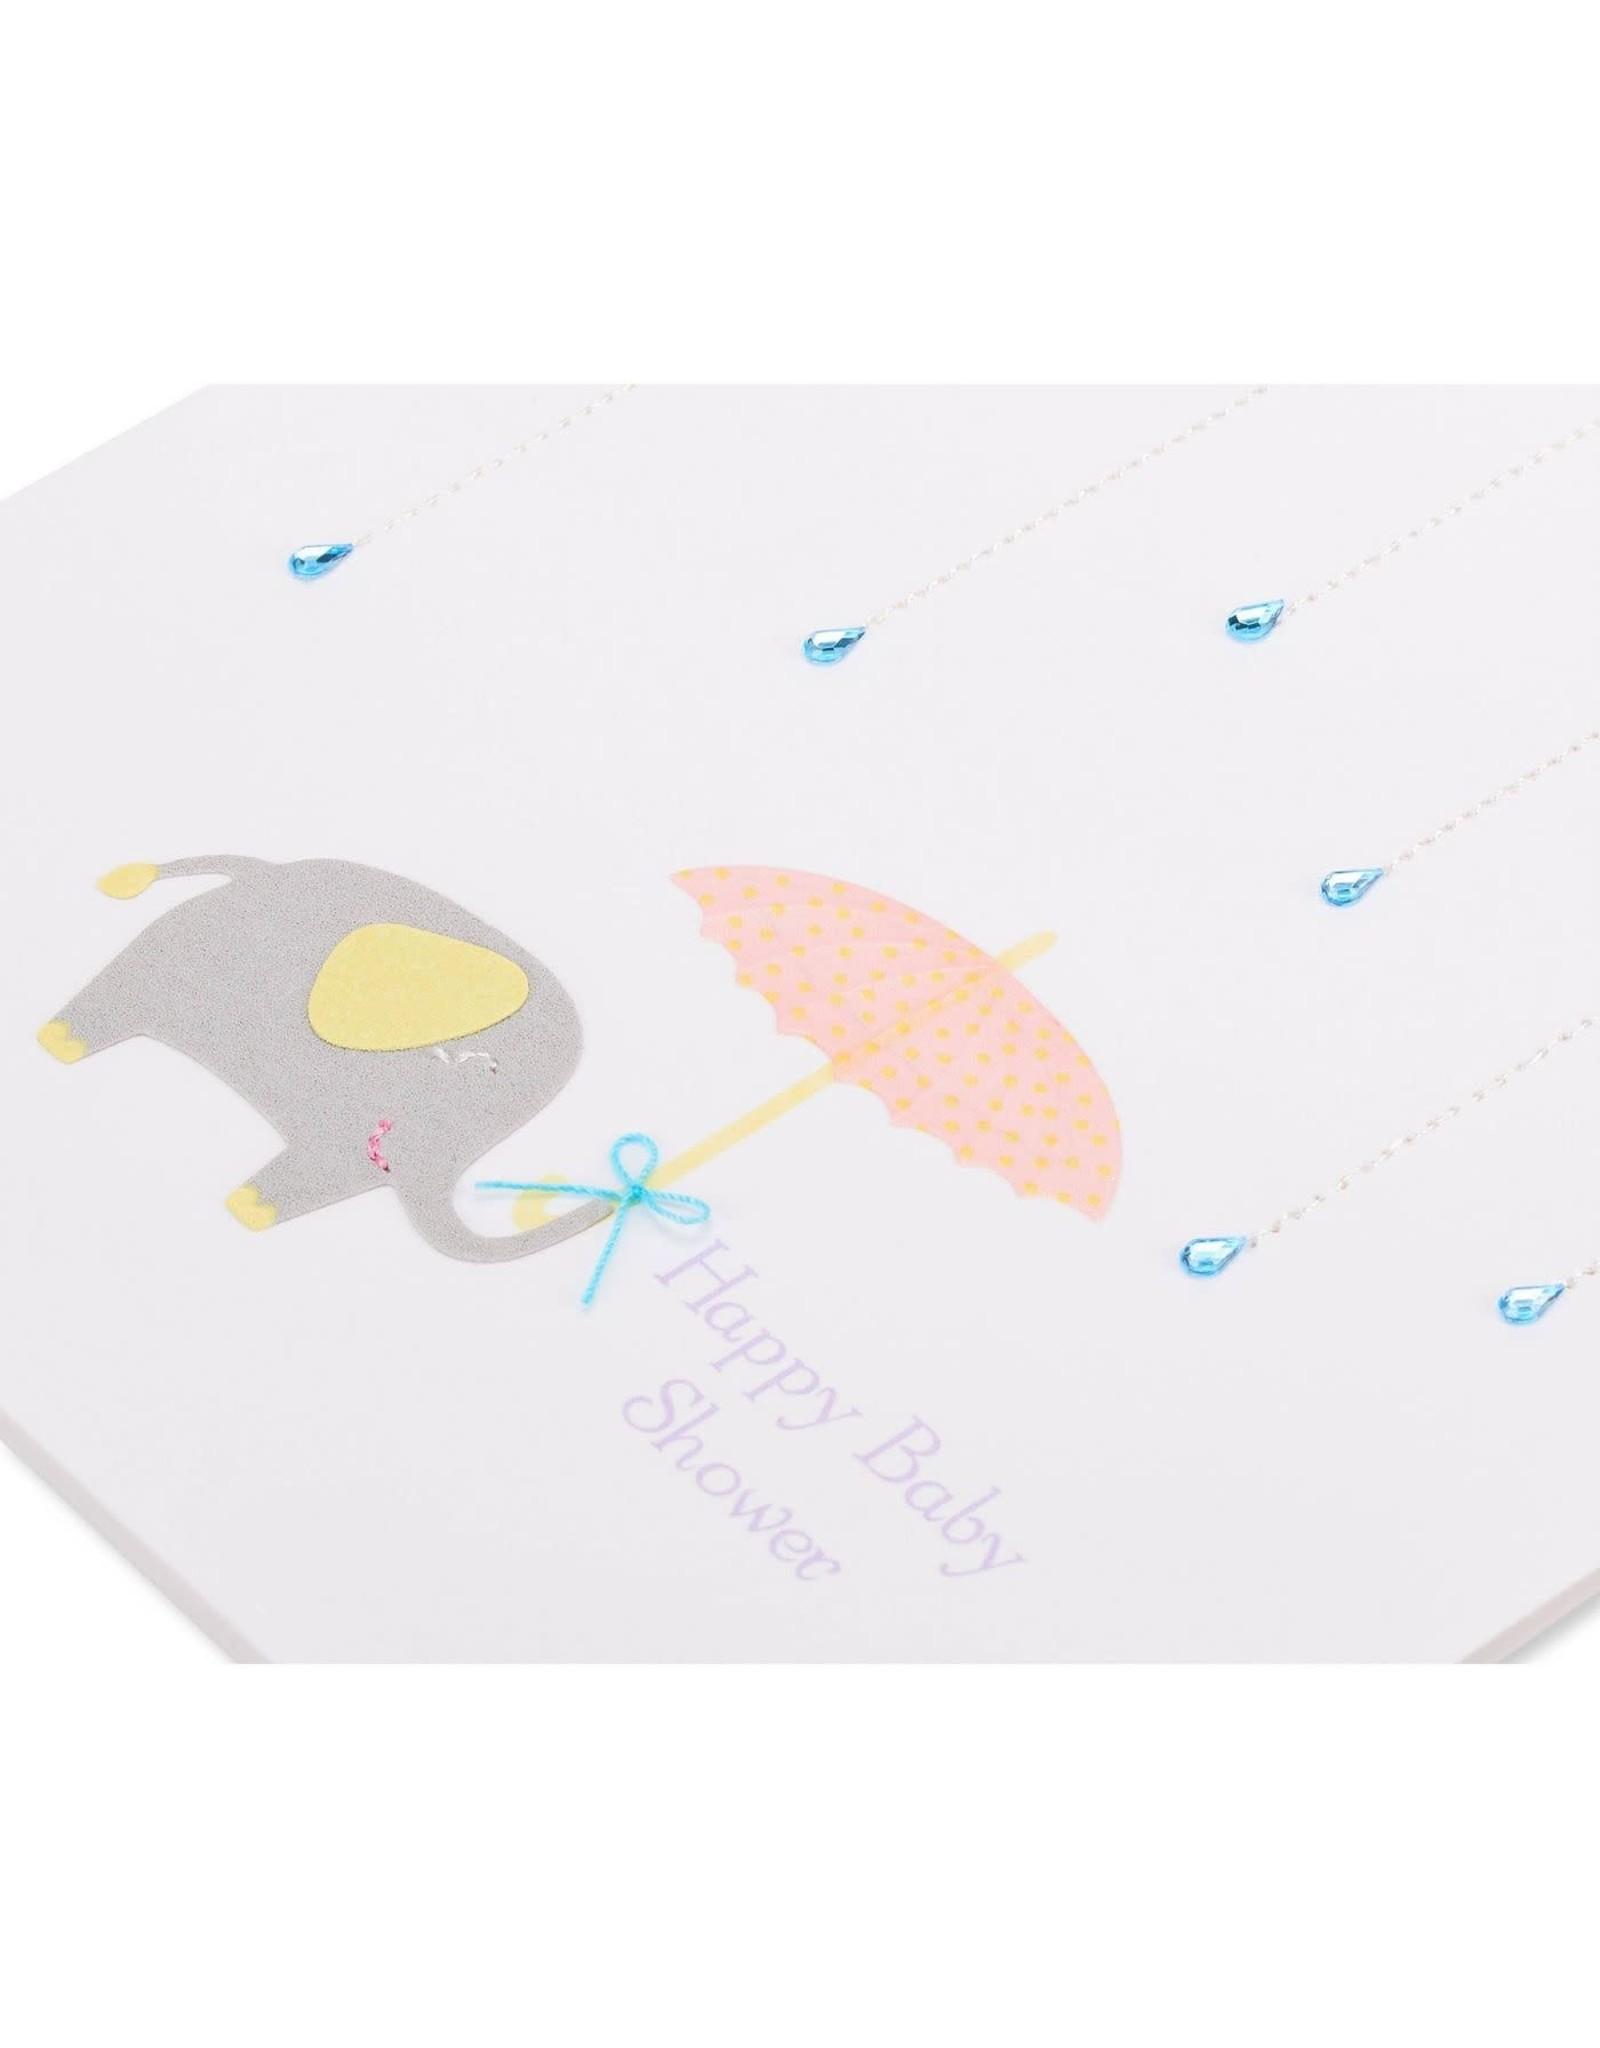 PAPYRUS® Baby Shower Card Raindrops Umbrella And Elephant